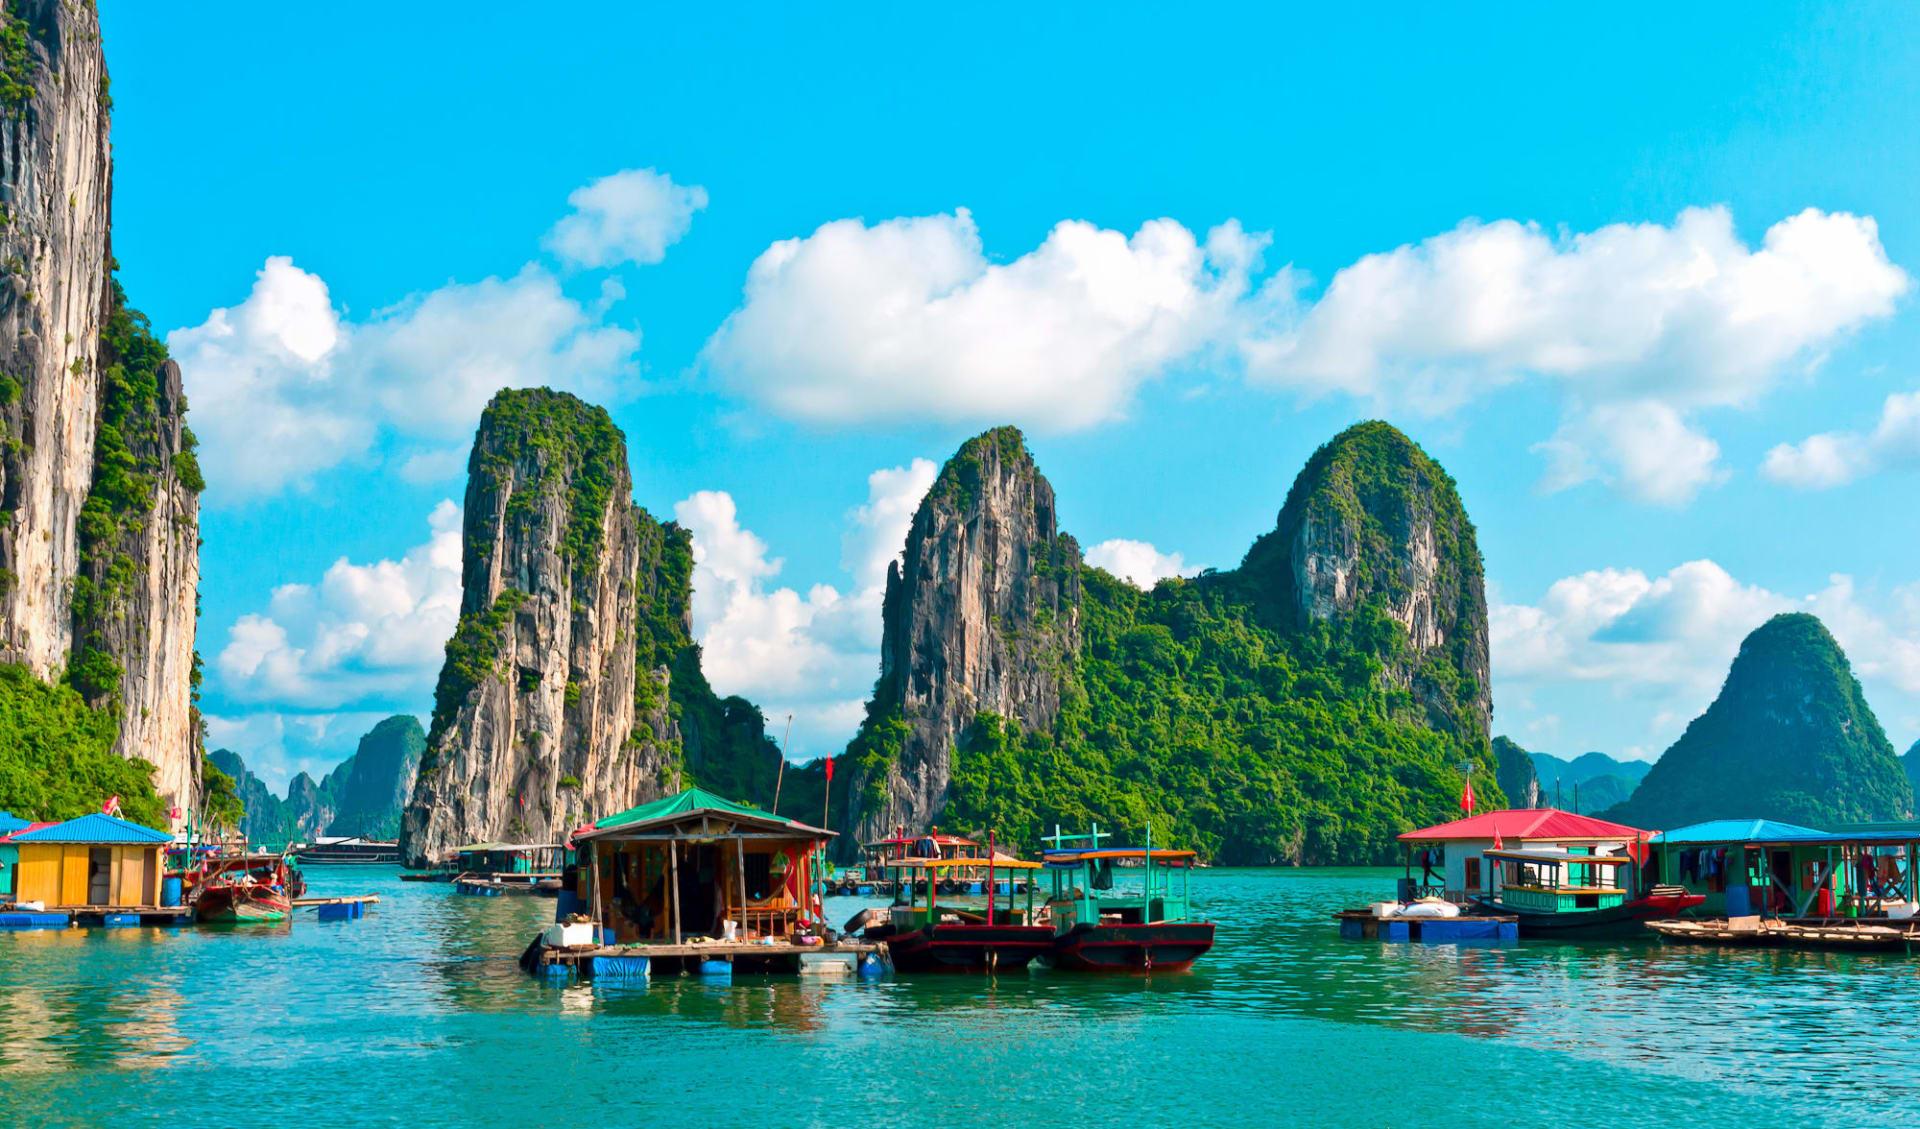 Halong Bucht Kreuzfahrten mit «Bhaya Premium» ab Hanoi: Halong Bay: Floating village and rock islands